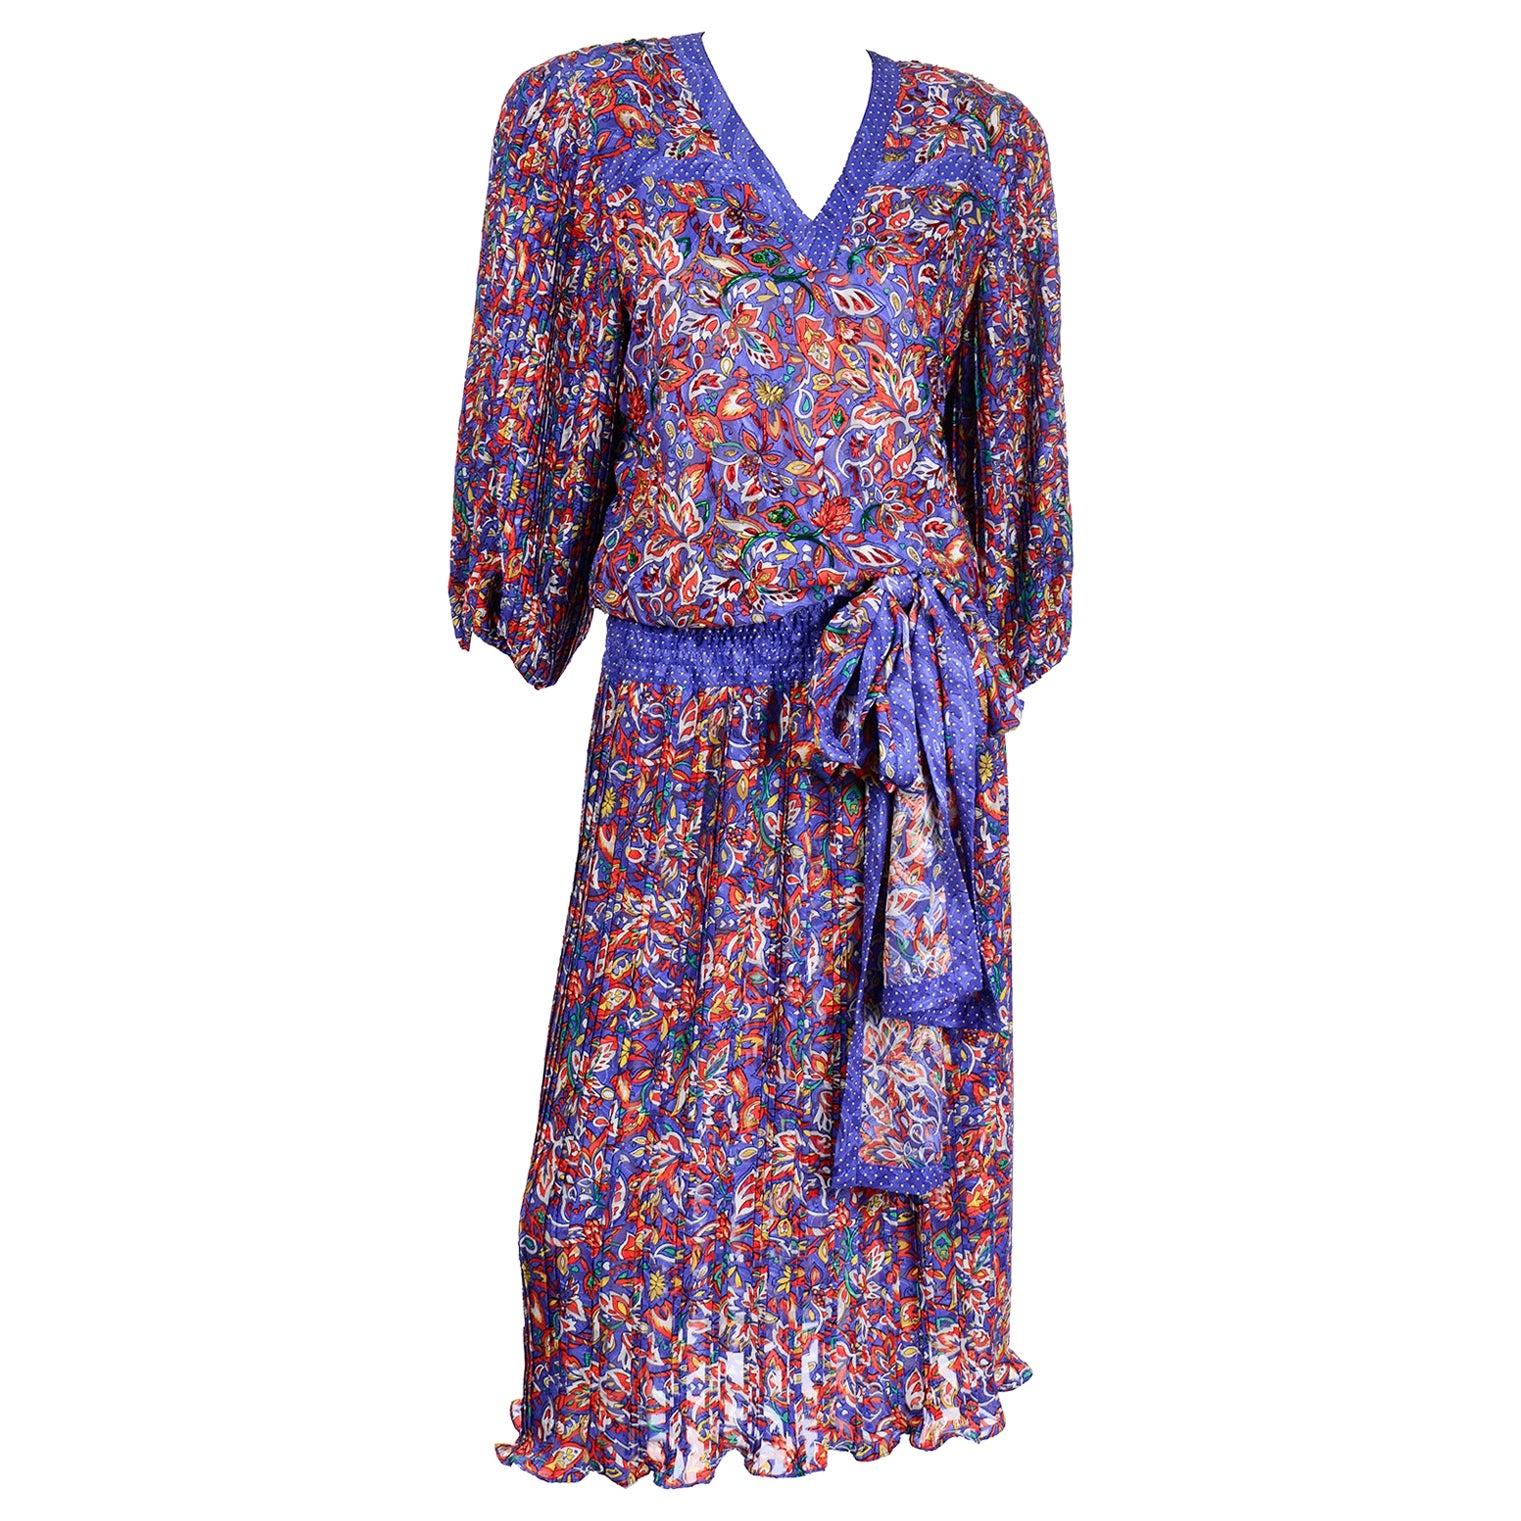 Vintage 1980s Diane Freis Colorful Mixed Pattern Print Beaded Dress W Sash